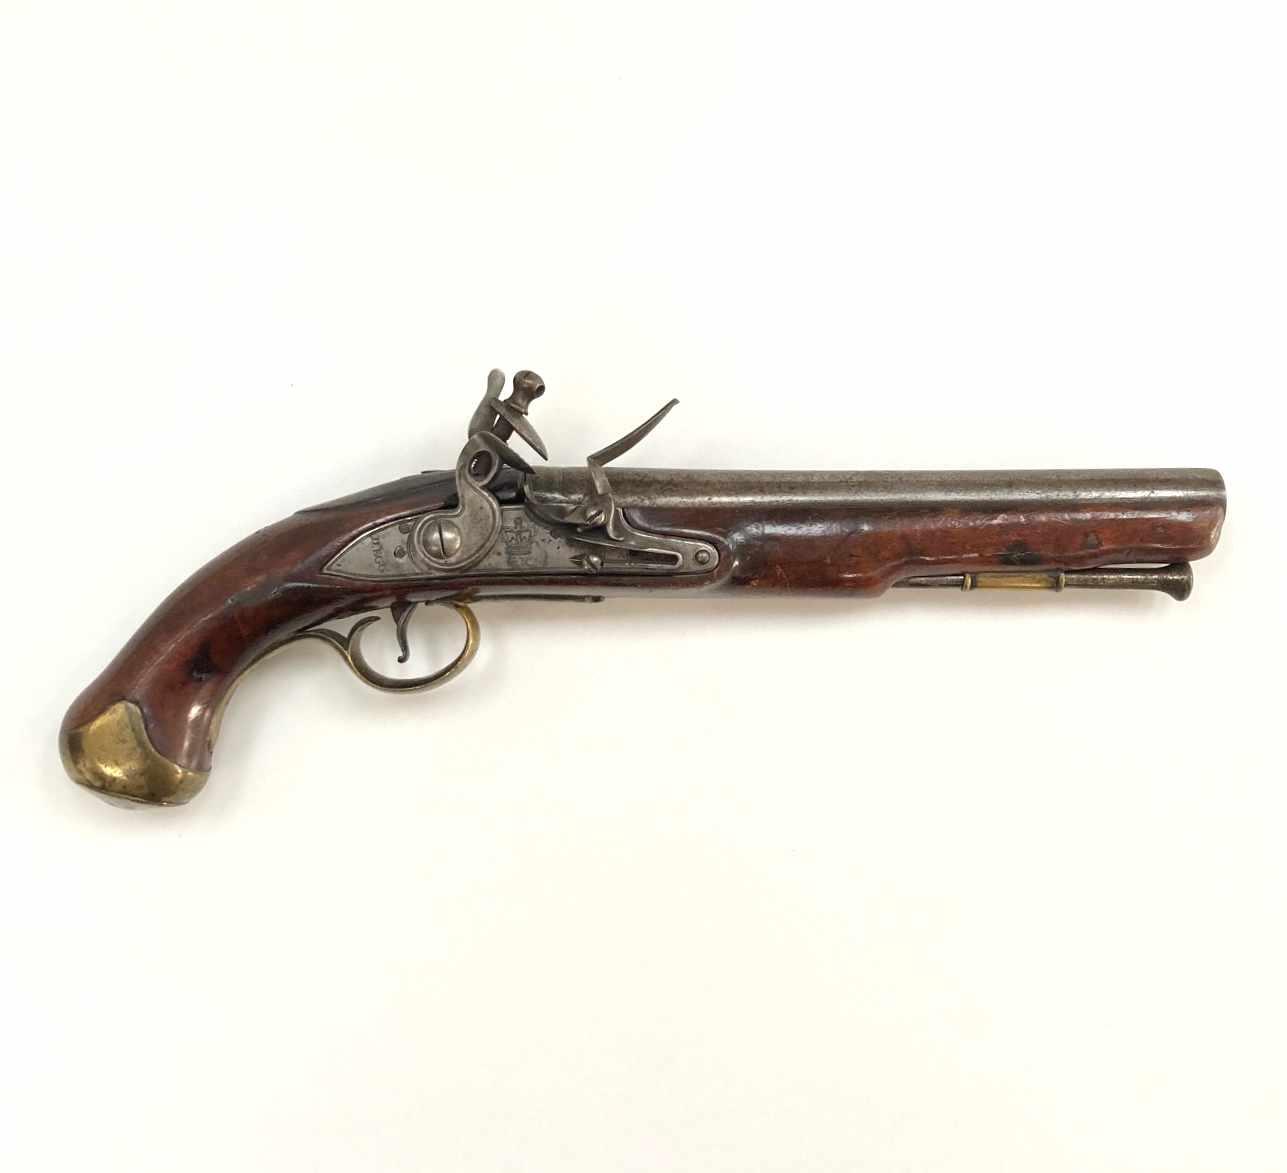 Napoleonic 1799 Pattern Light Dragoon Pistol by Durs Egg of London